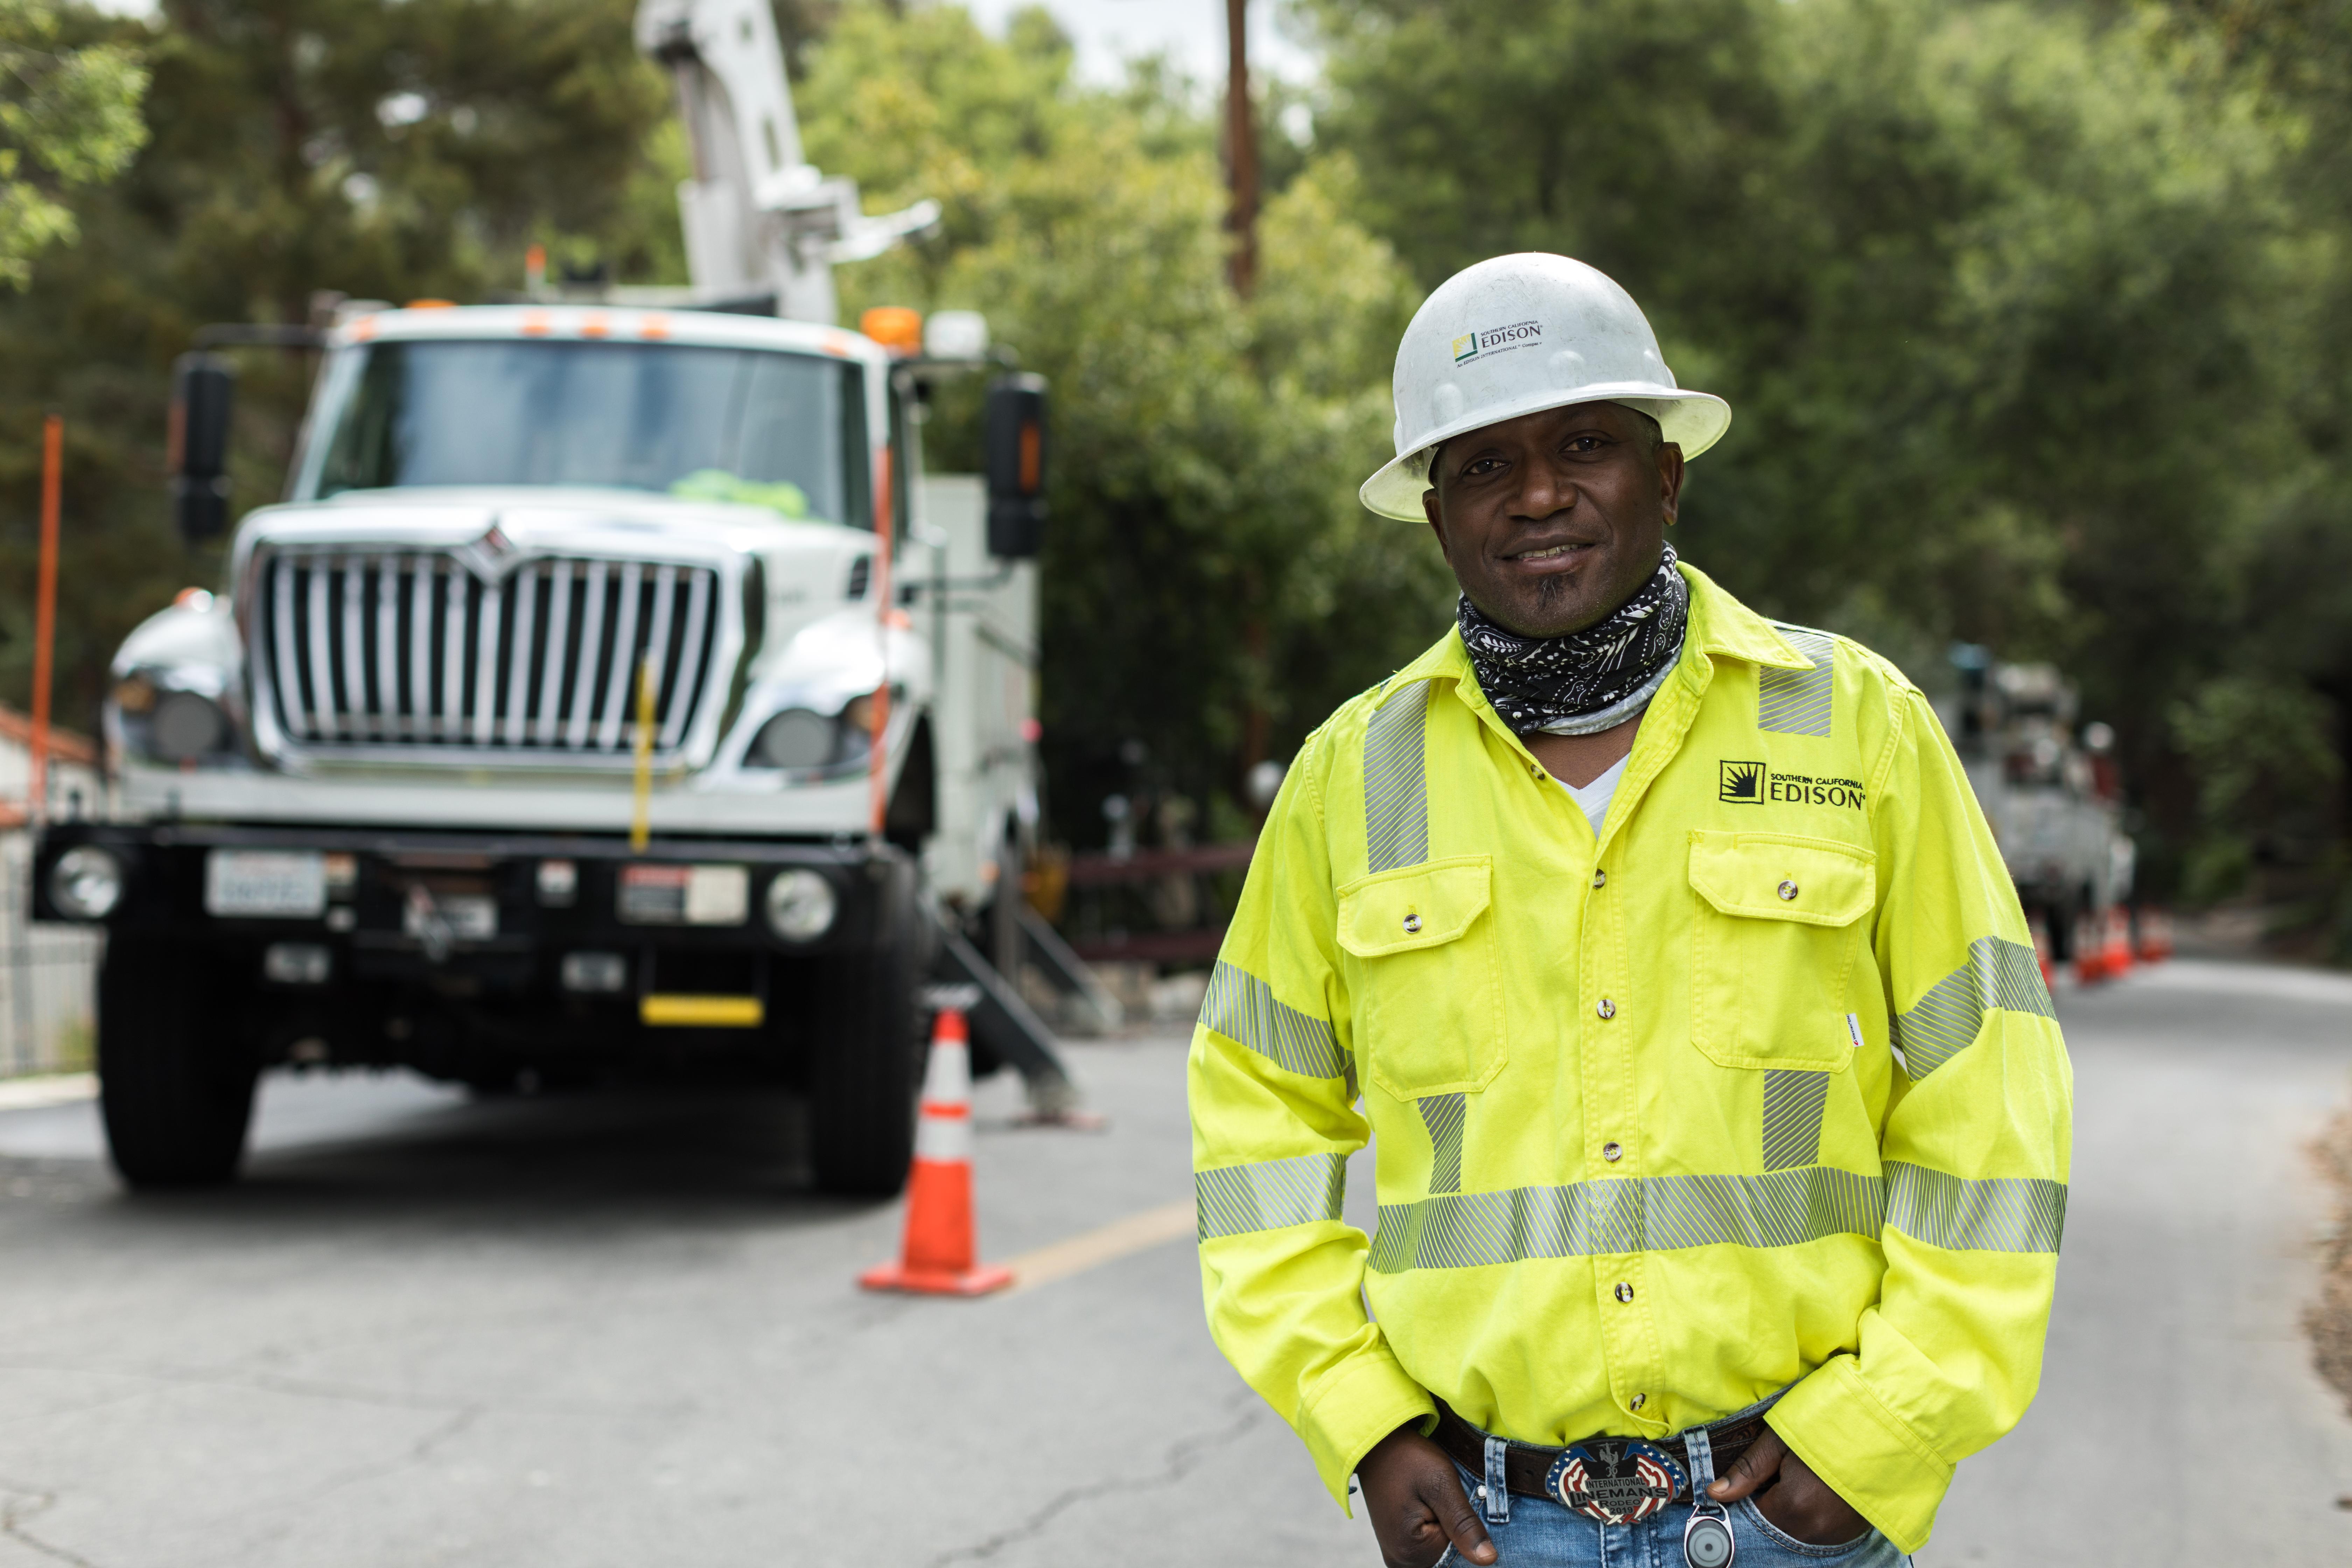 Eric Jones is a former SCE meter reader, groundman, apprentice, lineman, e-crew foreman and now field supervisor.